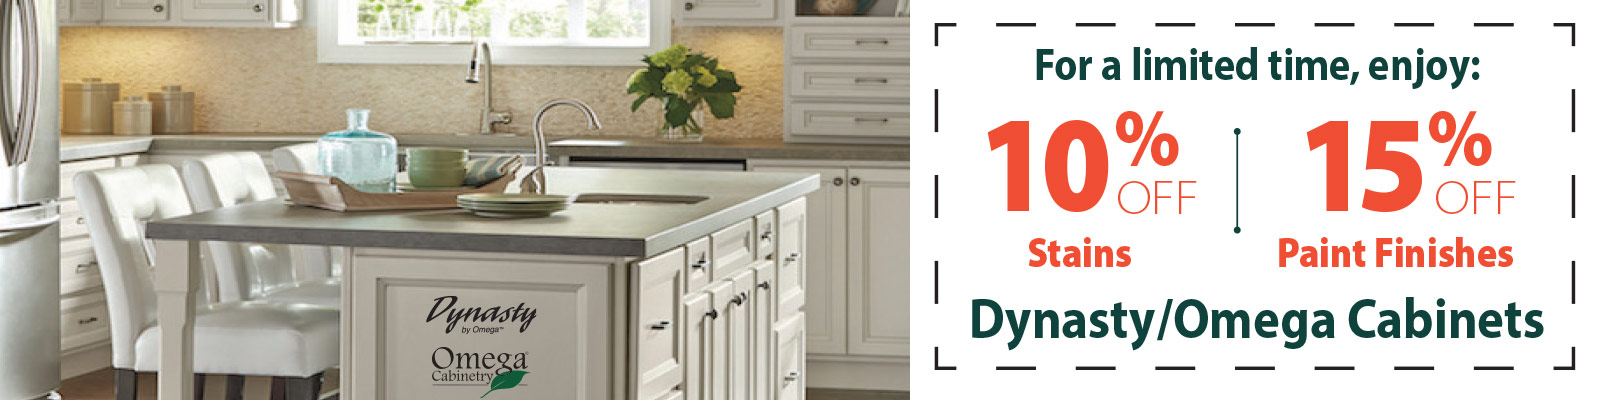 Dynasty Omega Cabinets